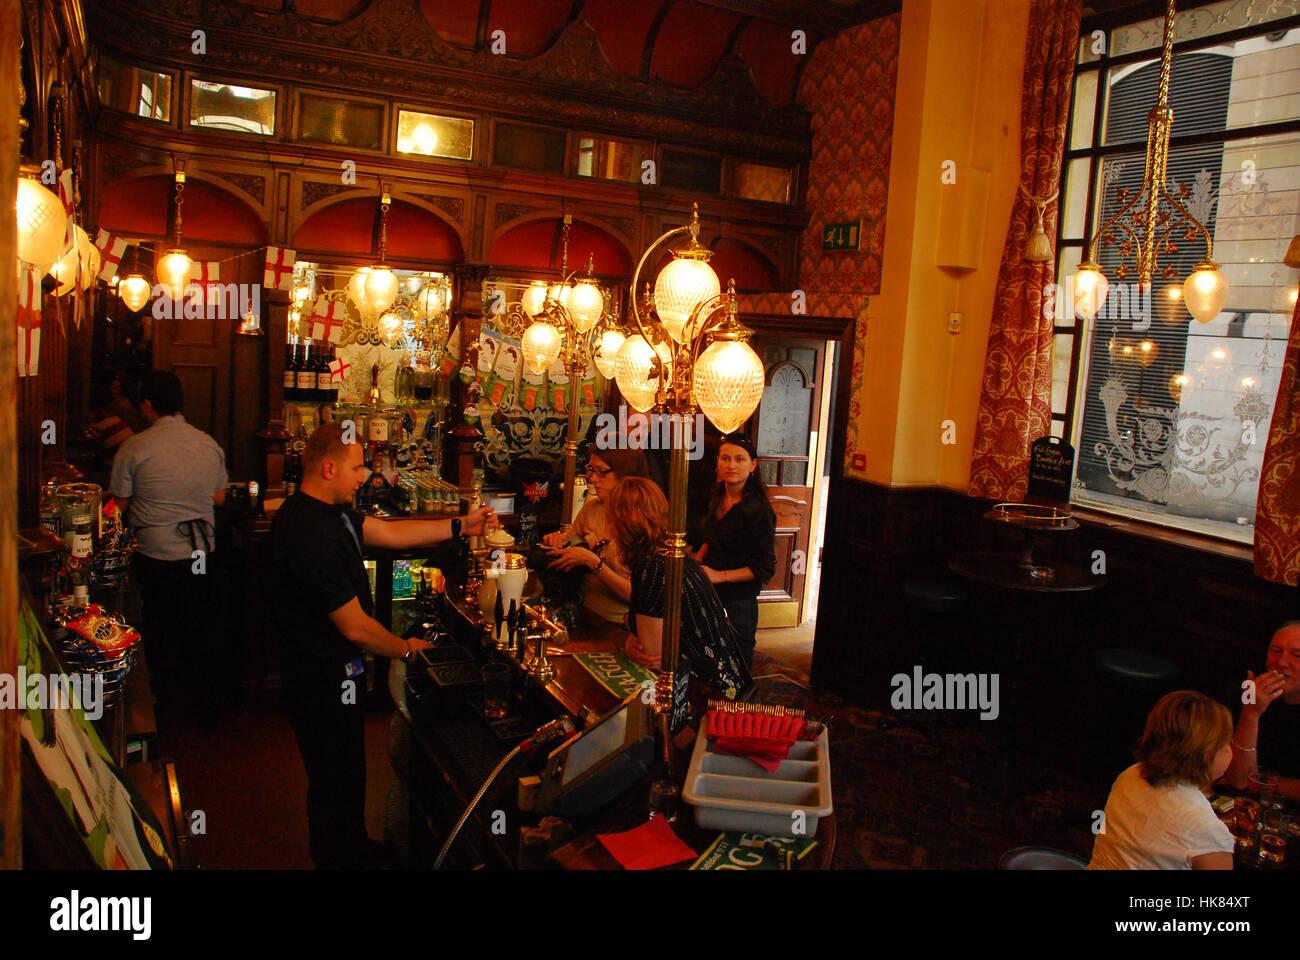 Inside a Pub London UK - Stock Image